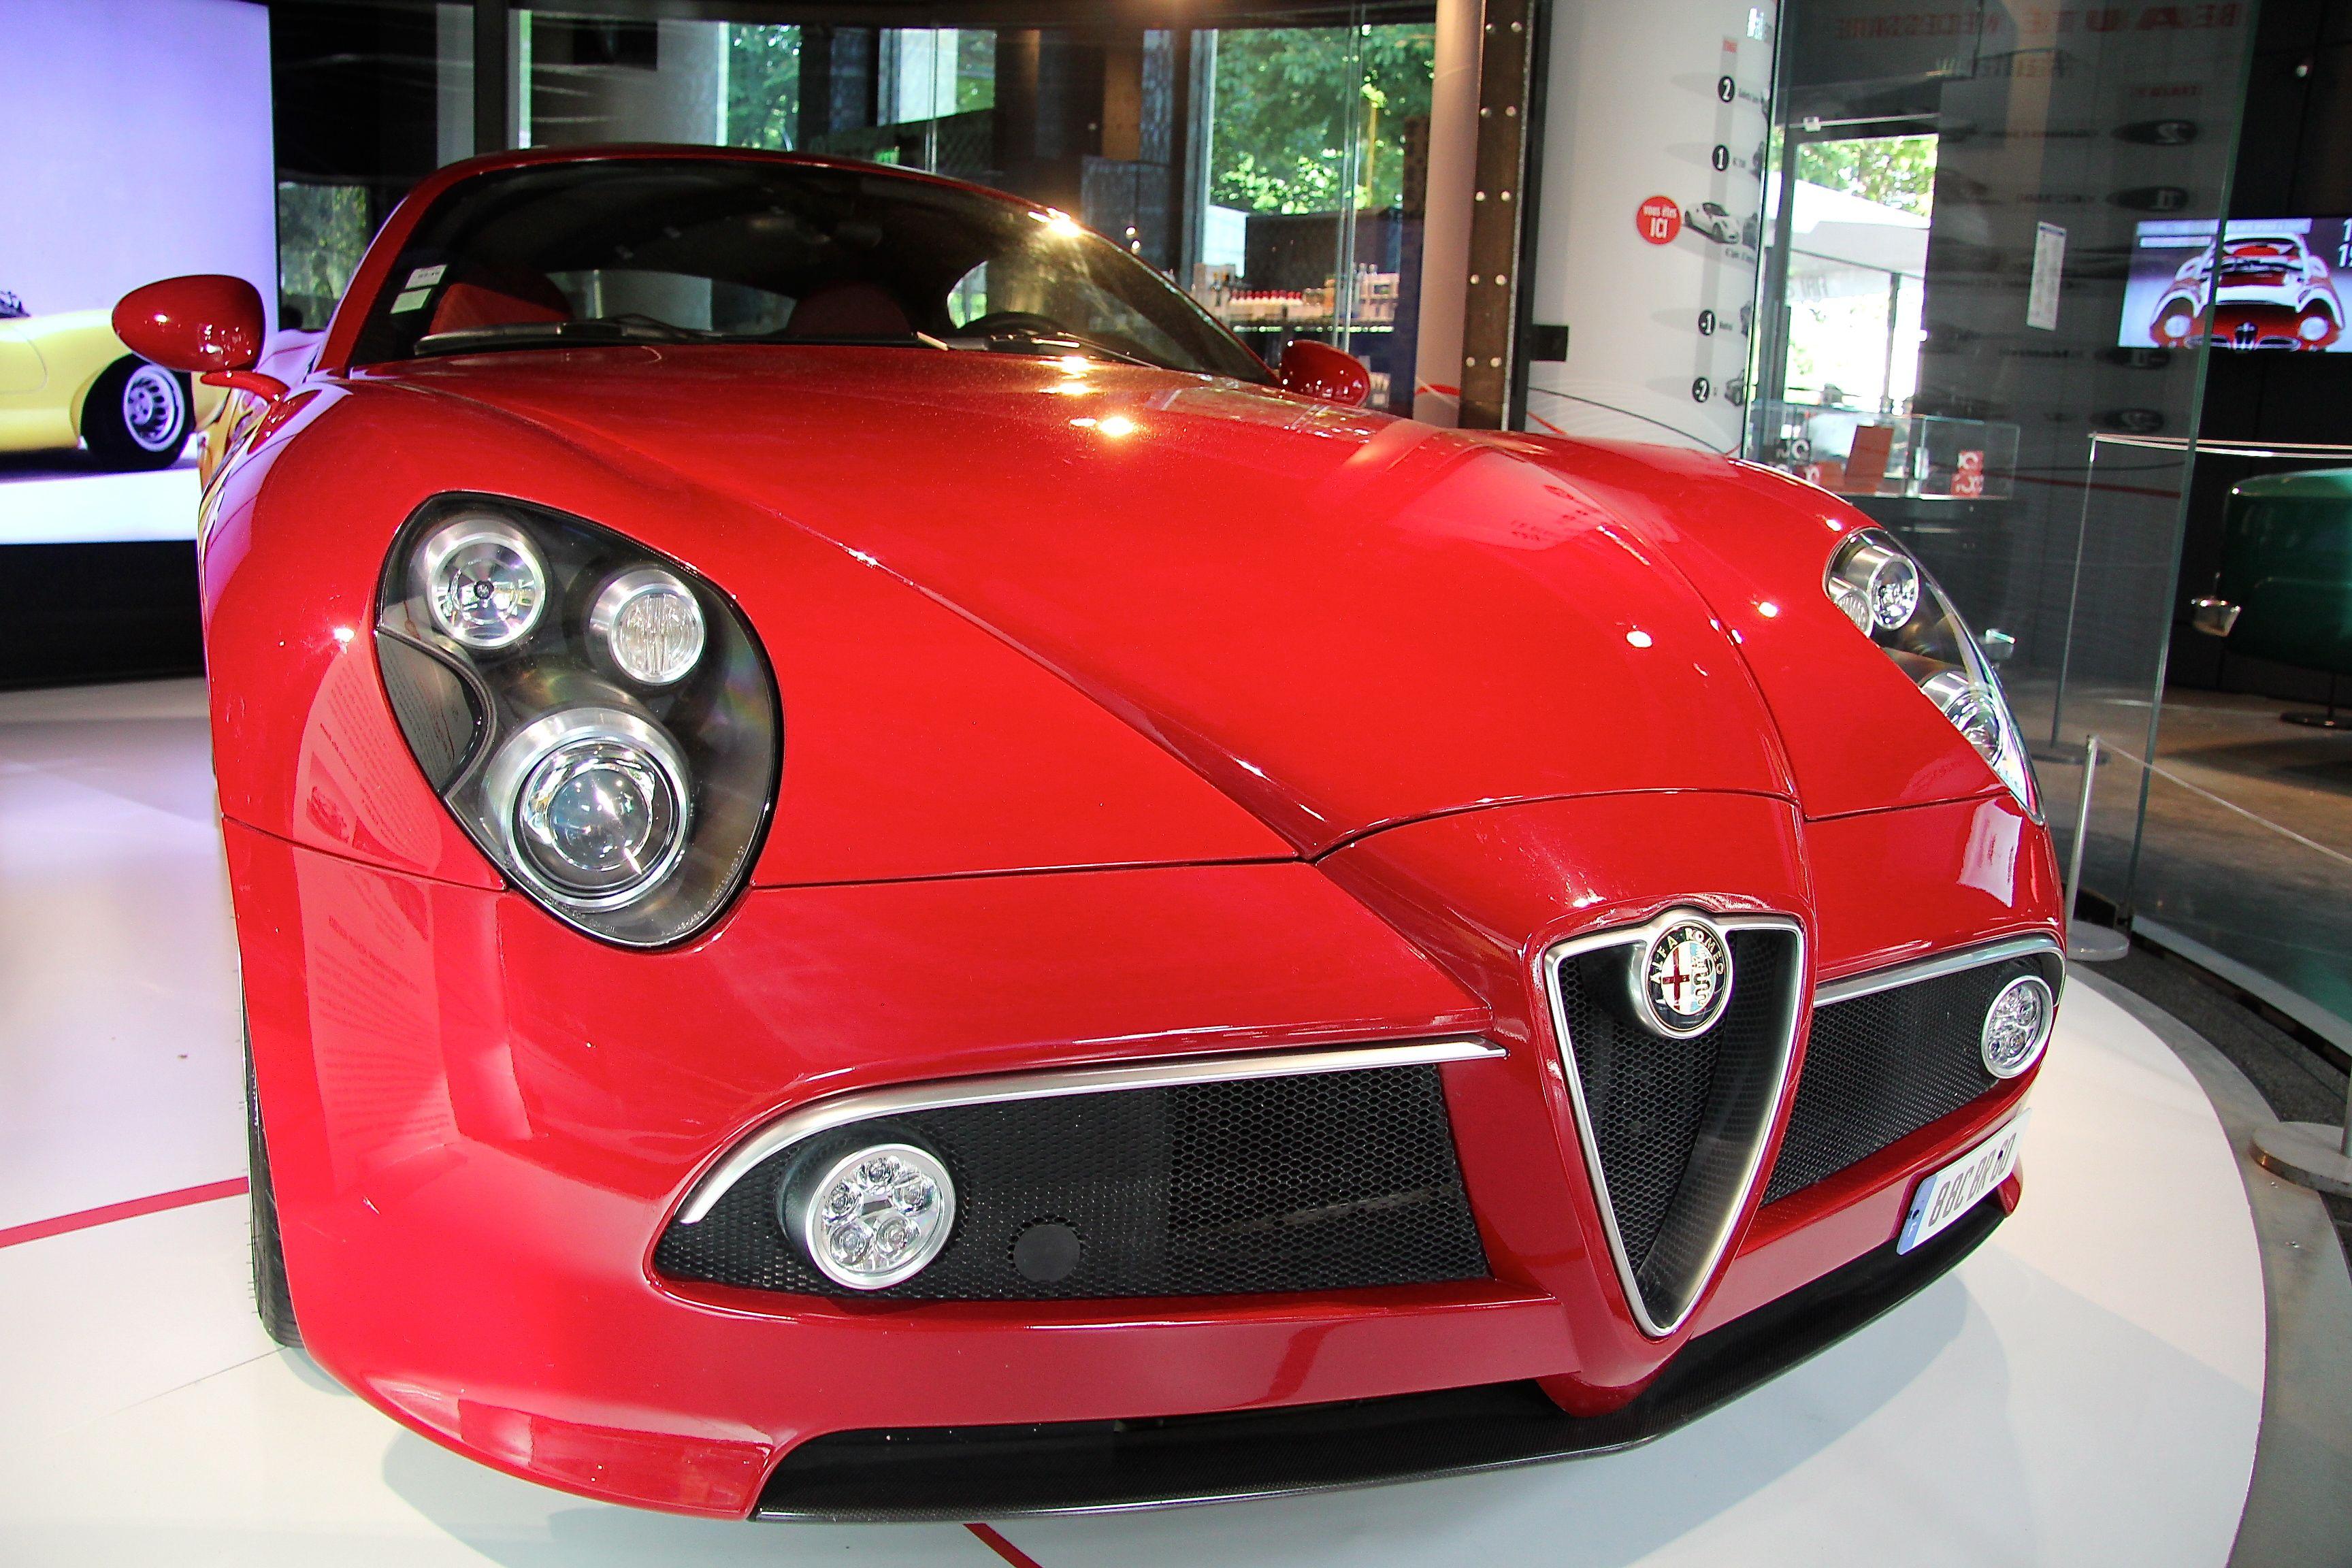 Alfa Romeo - 8C Competizione - MotorVillage - Alfa Romeo : la beauté nécessaire - 2015 - Photographie Ludo